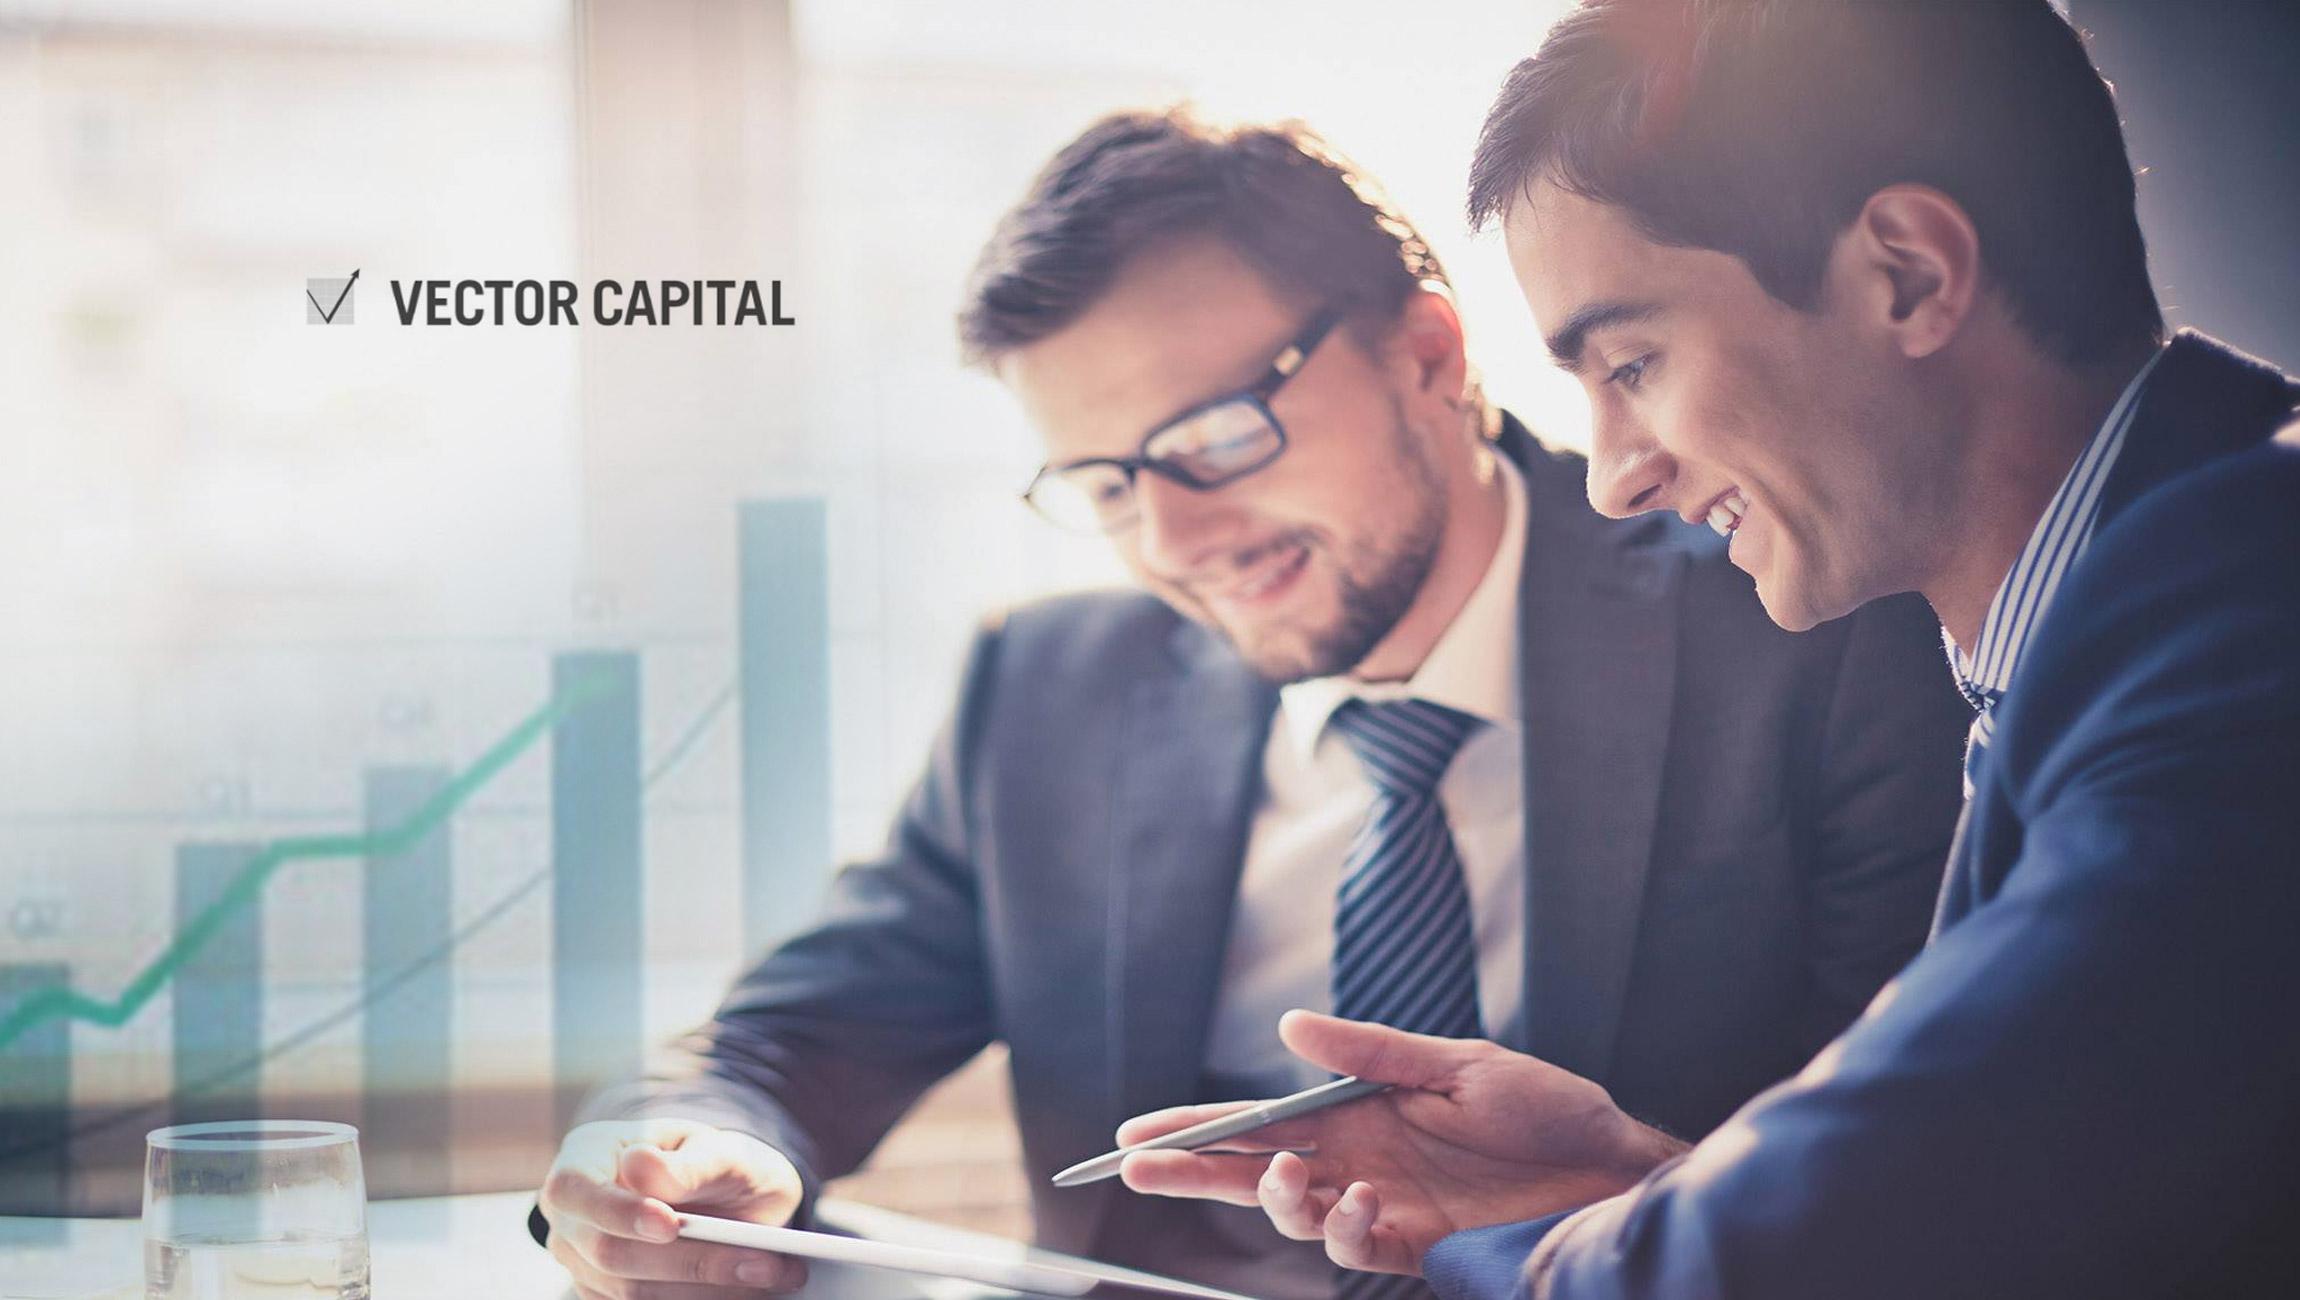 Vector Capital Portfolio Company Emarsys Completes Sale to SAP